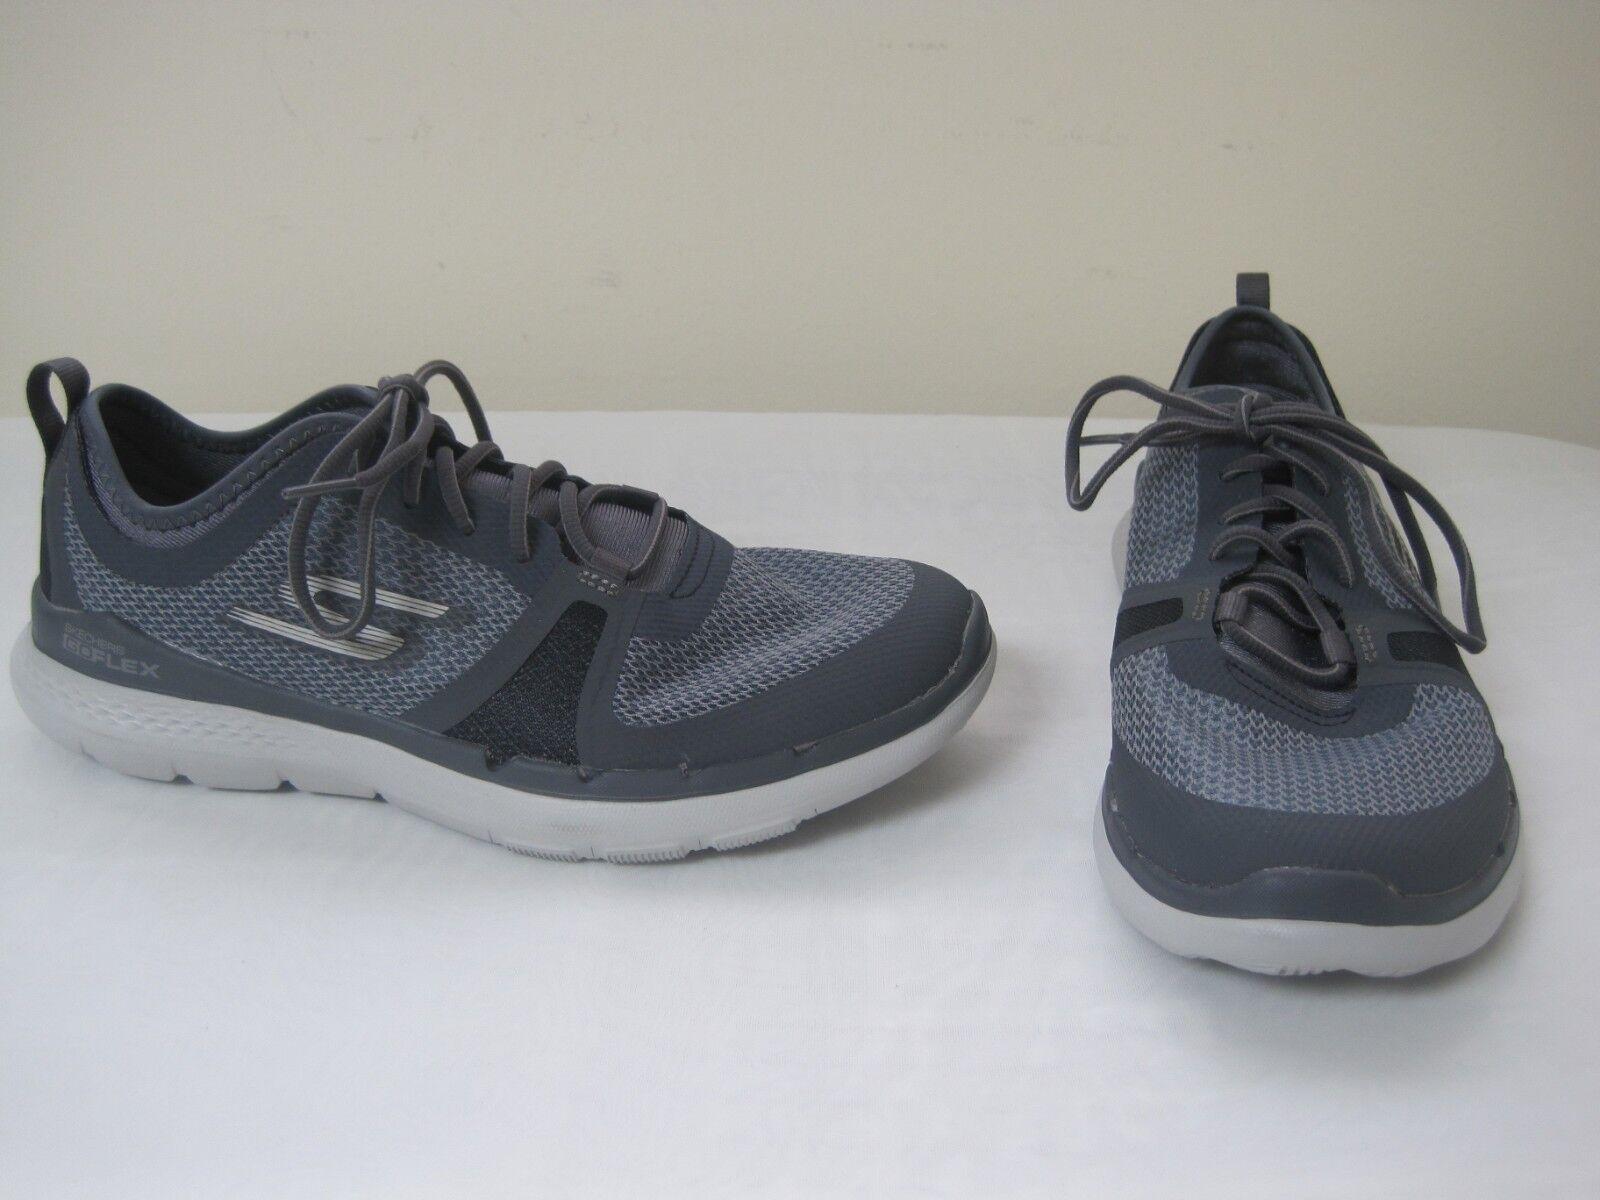 New Women's Skechers Go Flex Train Commit Athletic shoes 14823 Medium CHAR mc 41Q